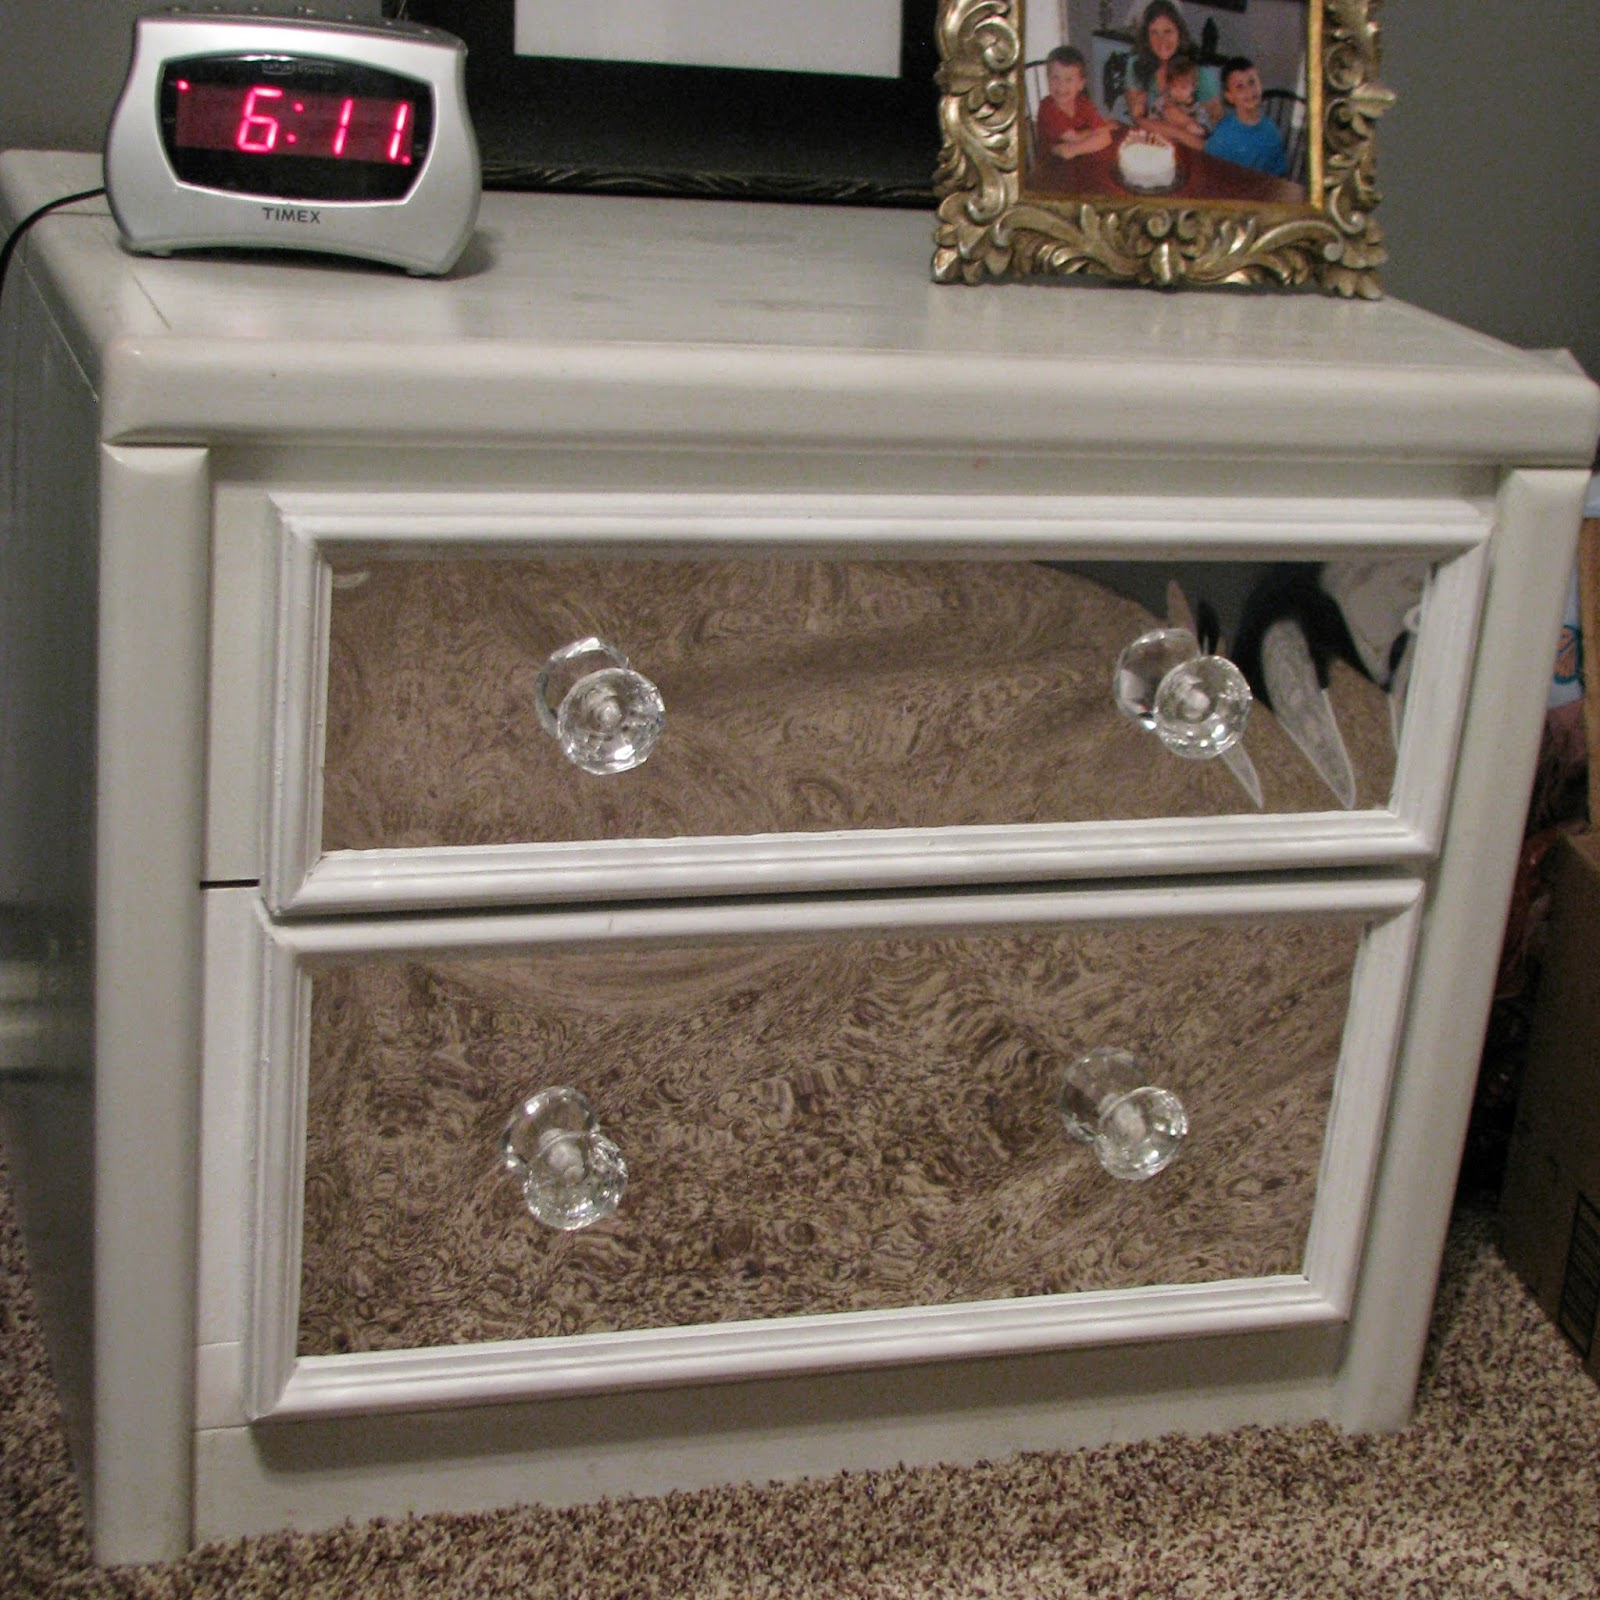 How To Make Mirrored Furniture Interesting Furniture DIY Mirrored